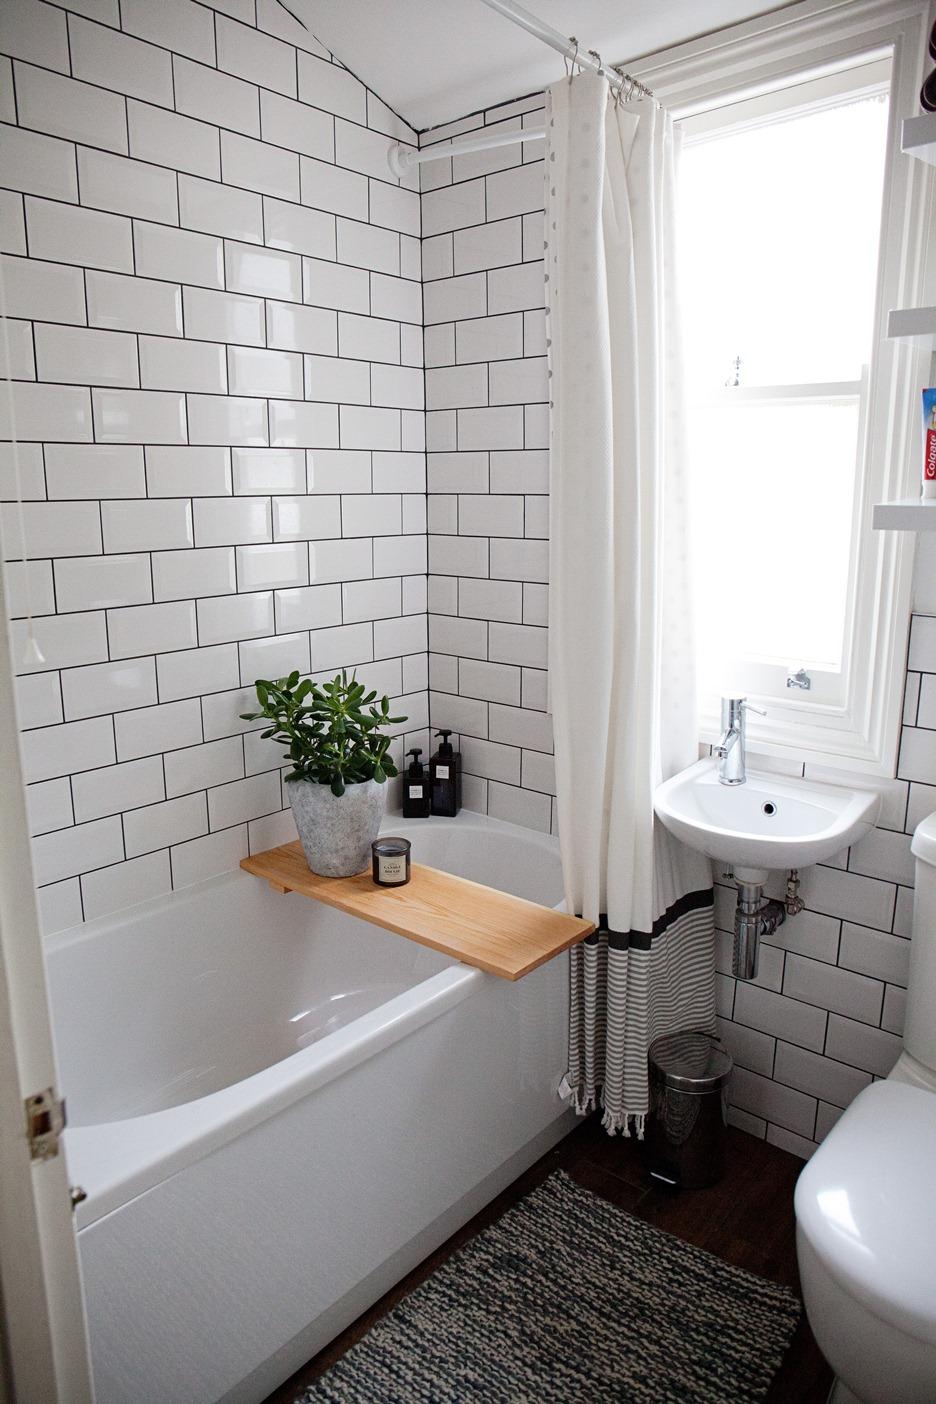 Bathroom Makeover Johannesburg bathroom makeover tv shows - amazing bedroom, living room